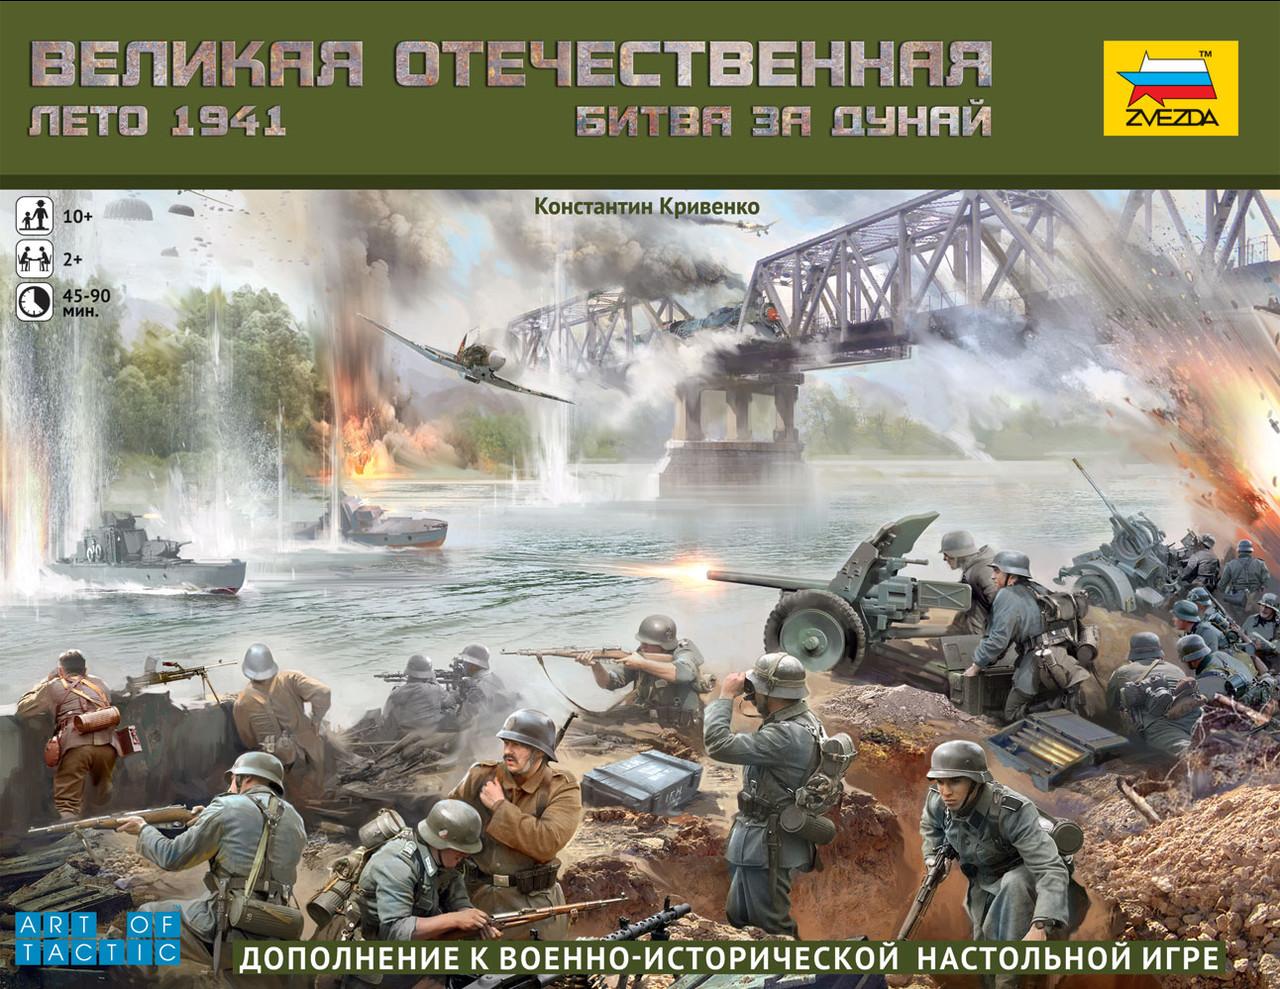 Великая Отечественная. Лето 1941. Битва за Дунай